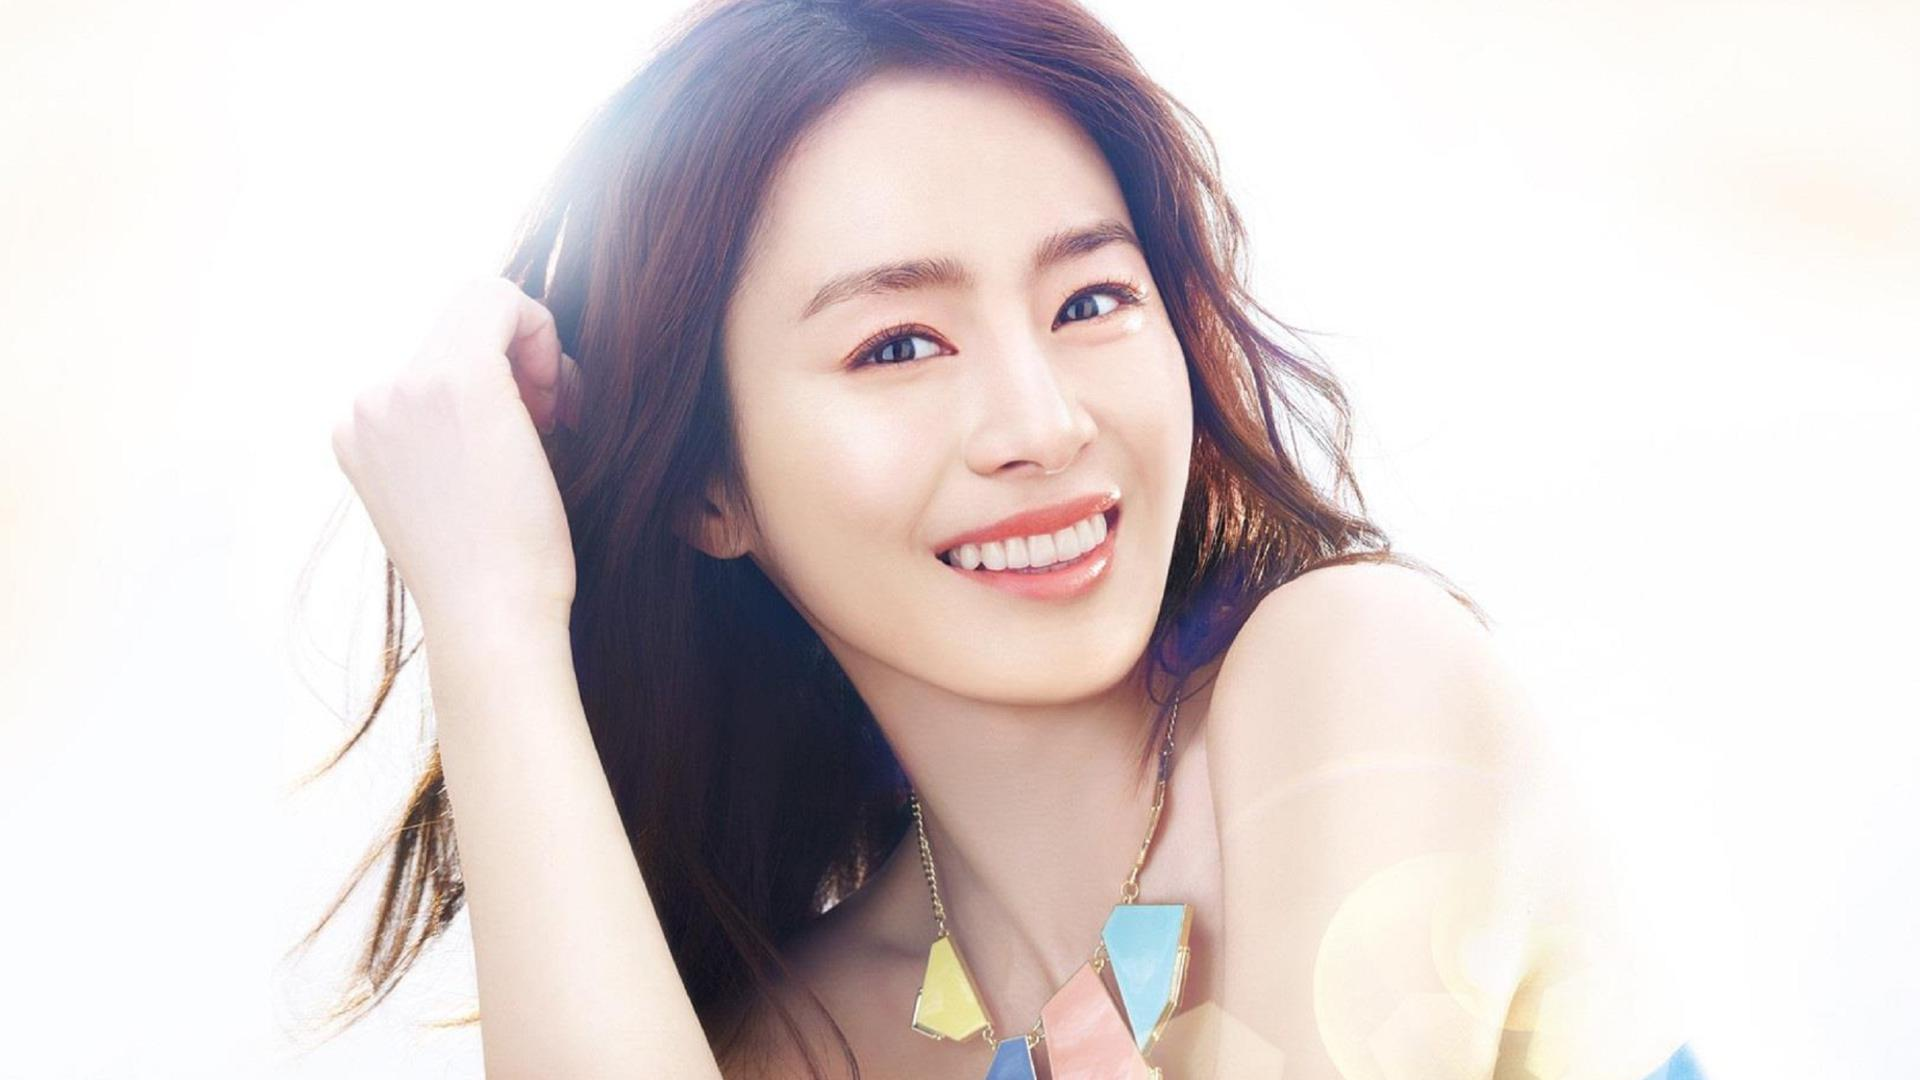 Download photo 1920x1080, kim tae hee, korean girl ...